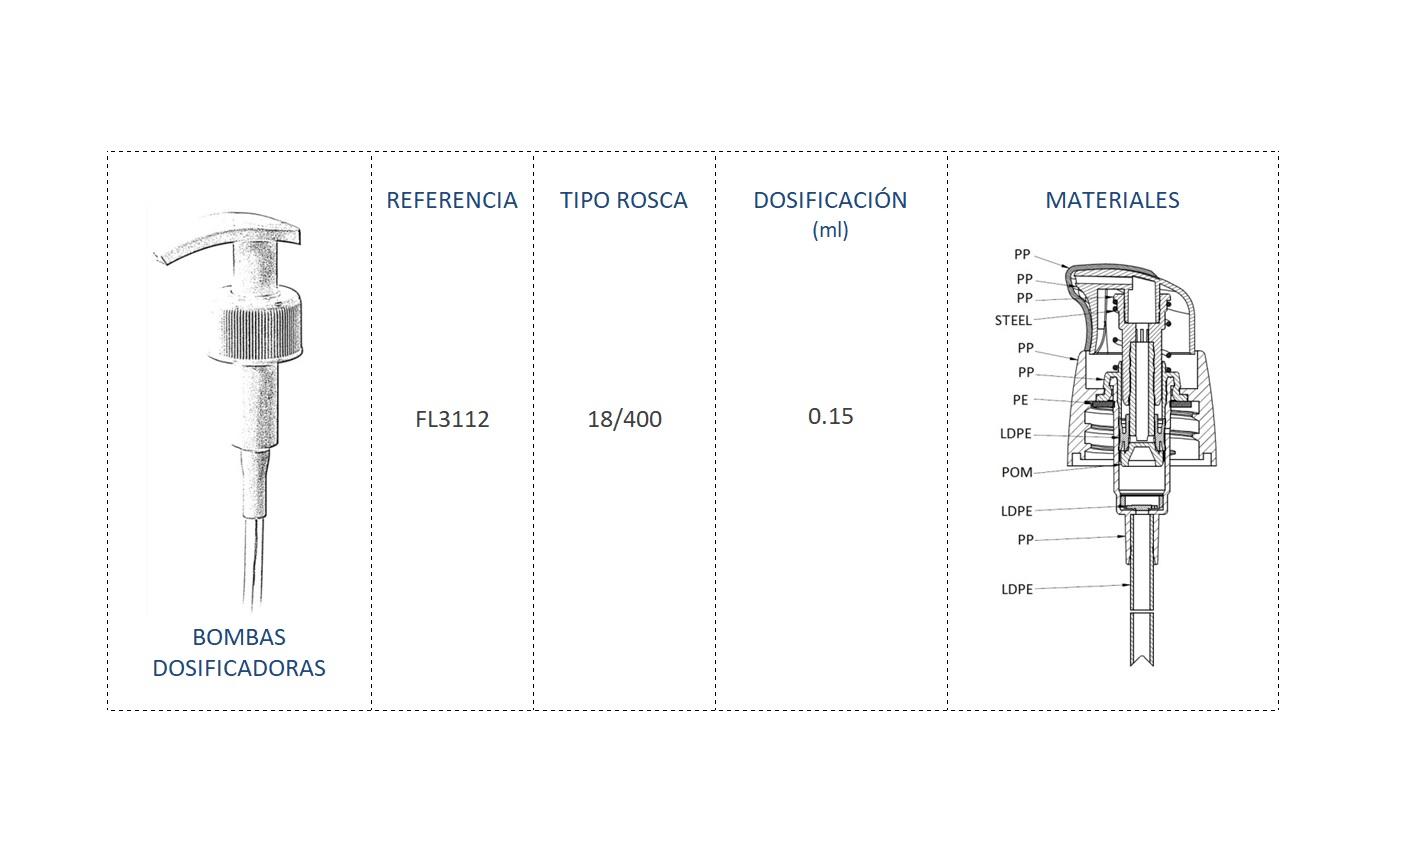 Cuadro de materiales bomba dosificadora FL3112 18/400